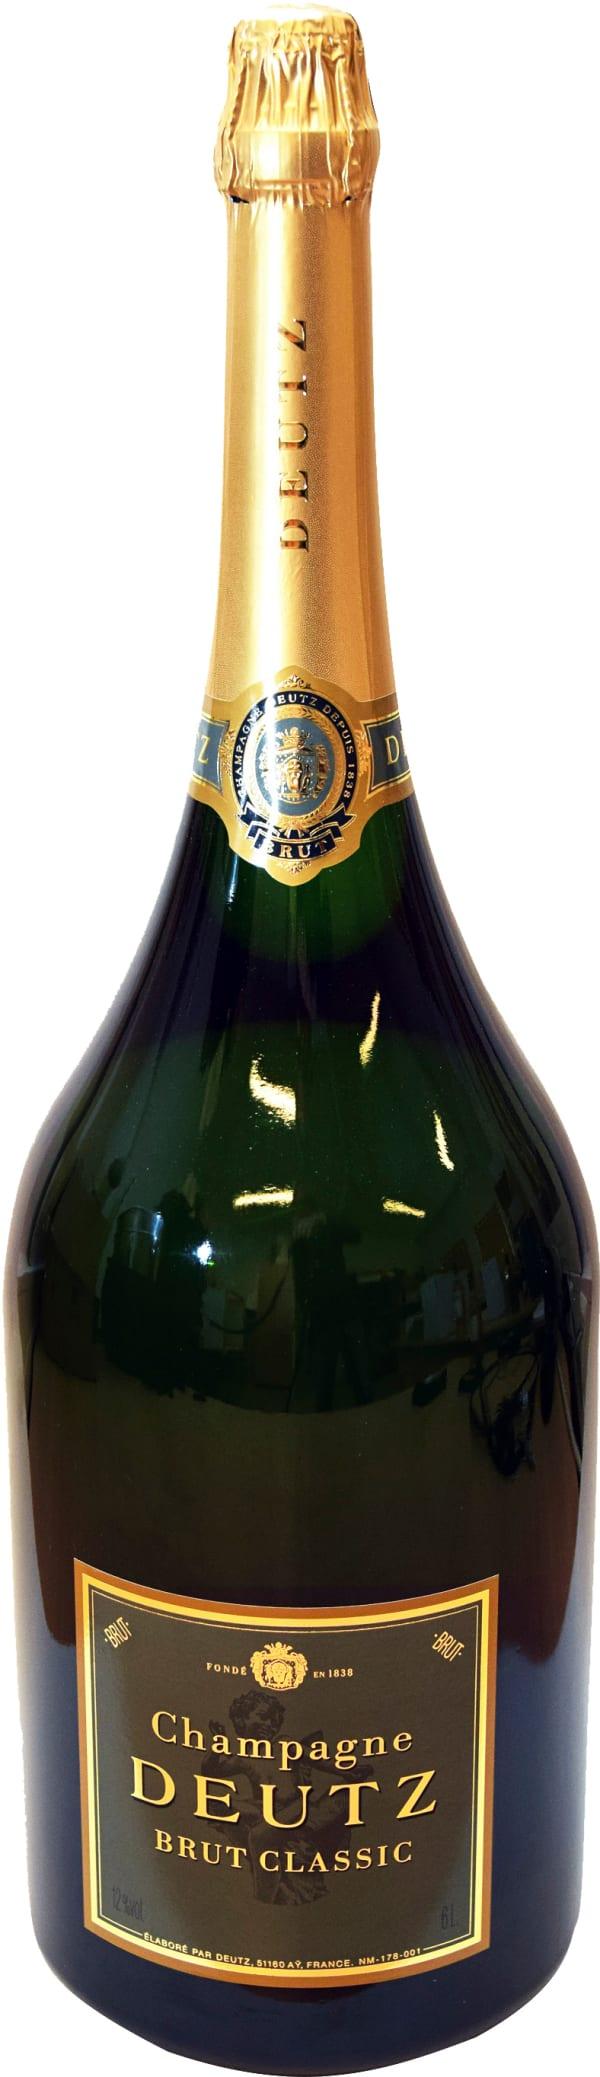 Deutz Classic Champagne Brut Mathusalem